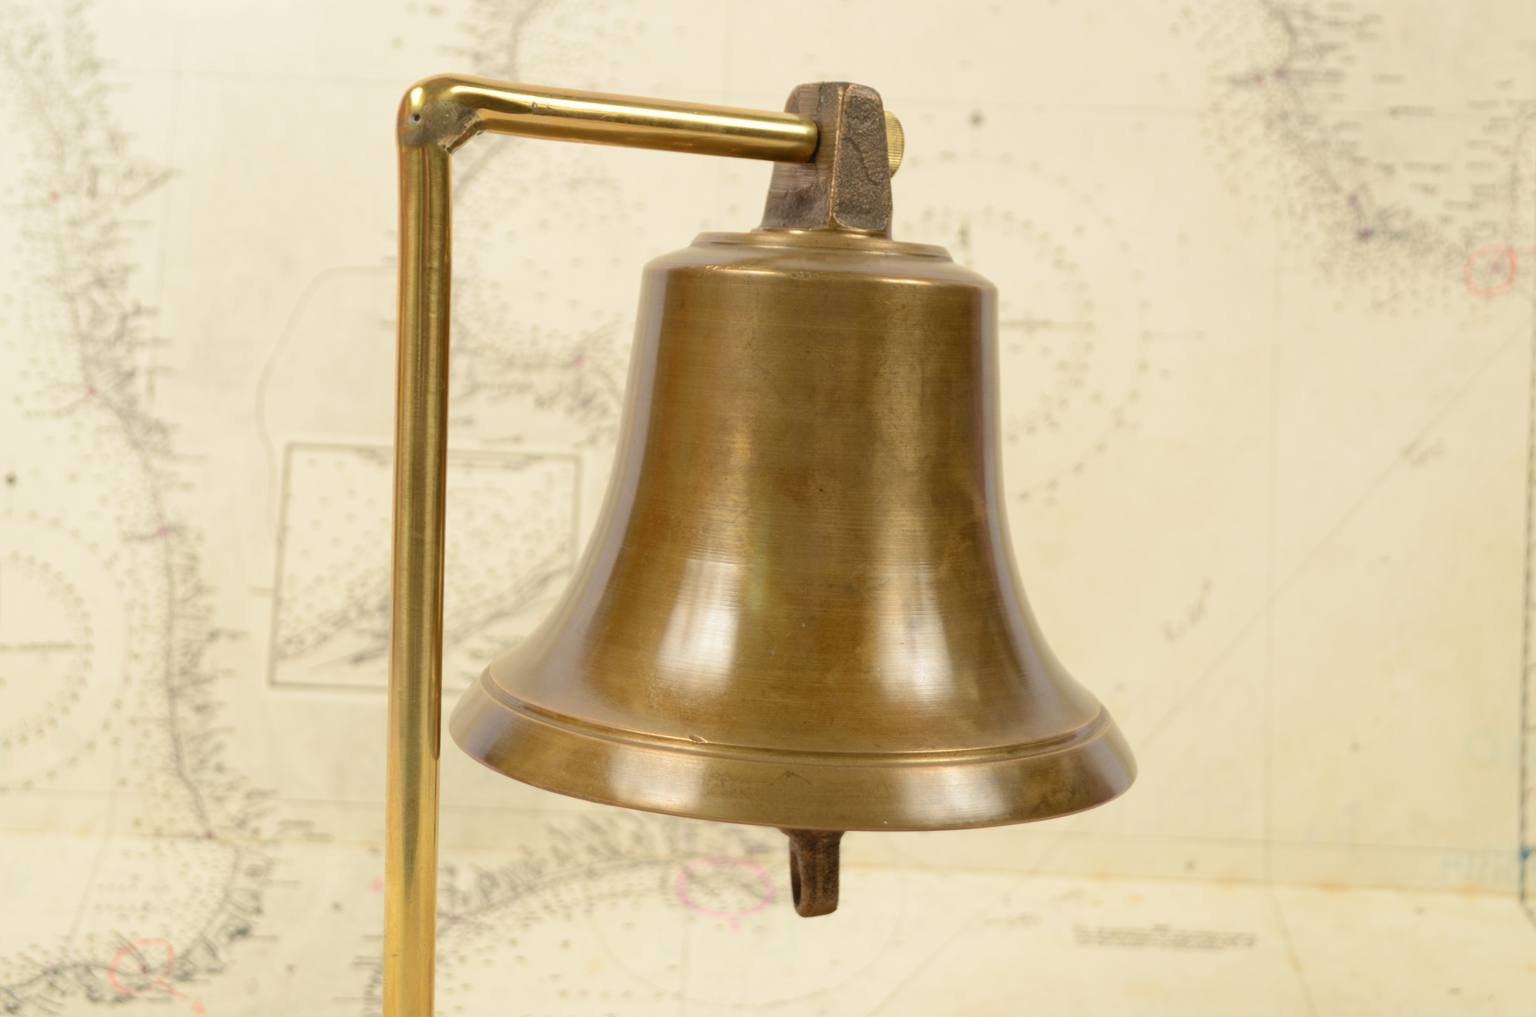 Antiquariato nautico/4902-Campana nautica